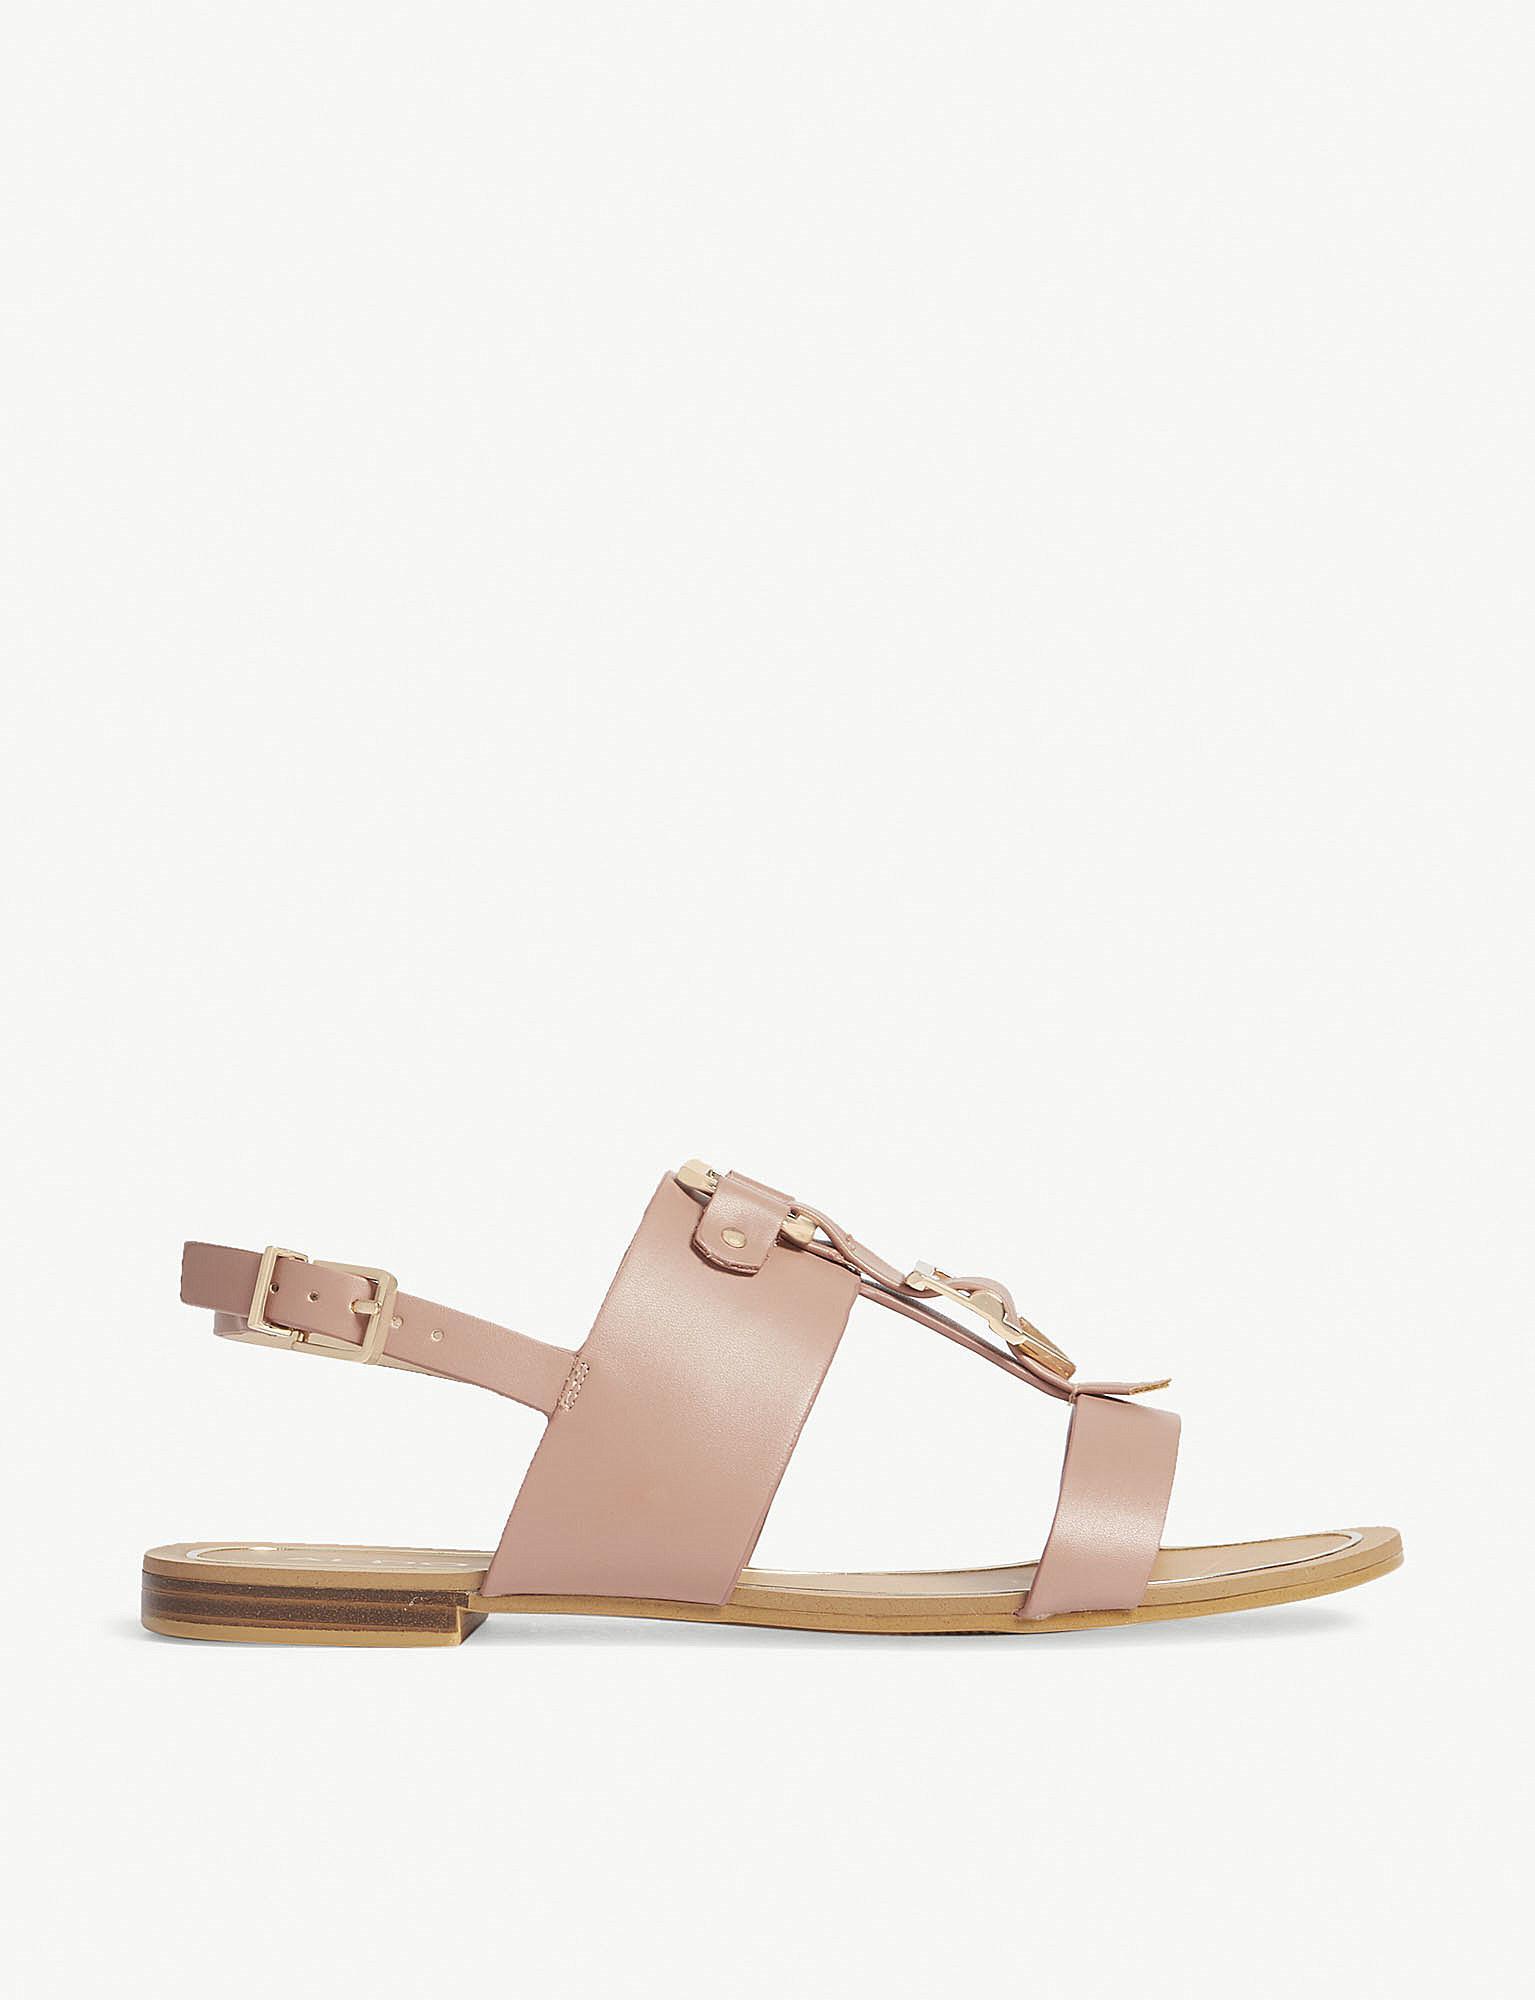 19a78cc64f65 Lyst - ALDO Afiarien Buckle Sandals in Pink